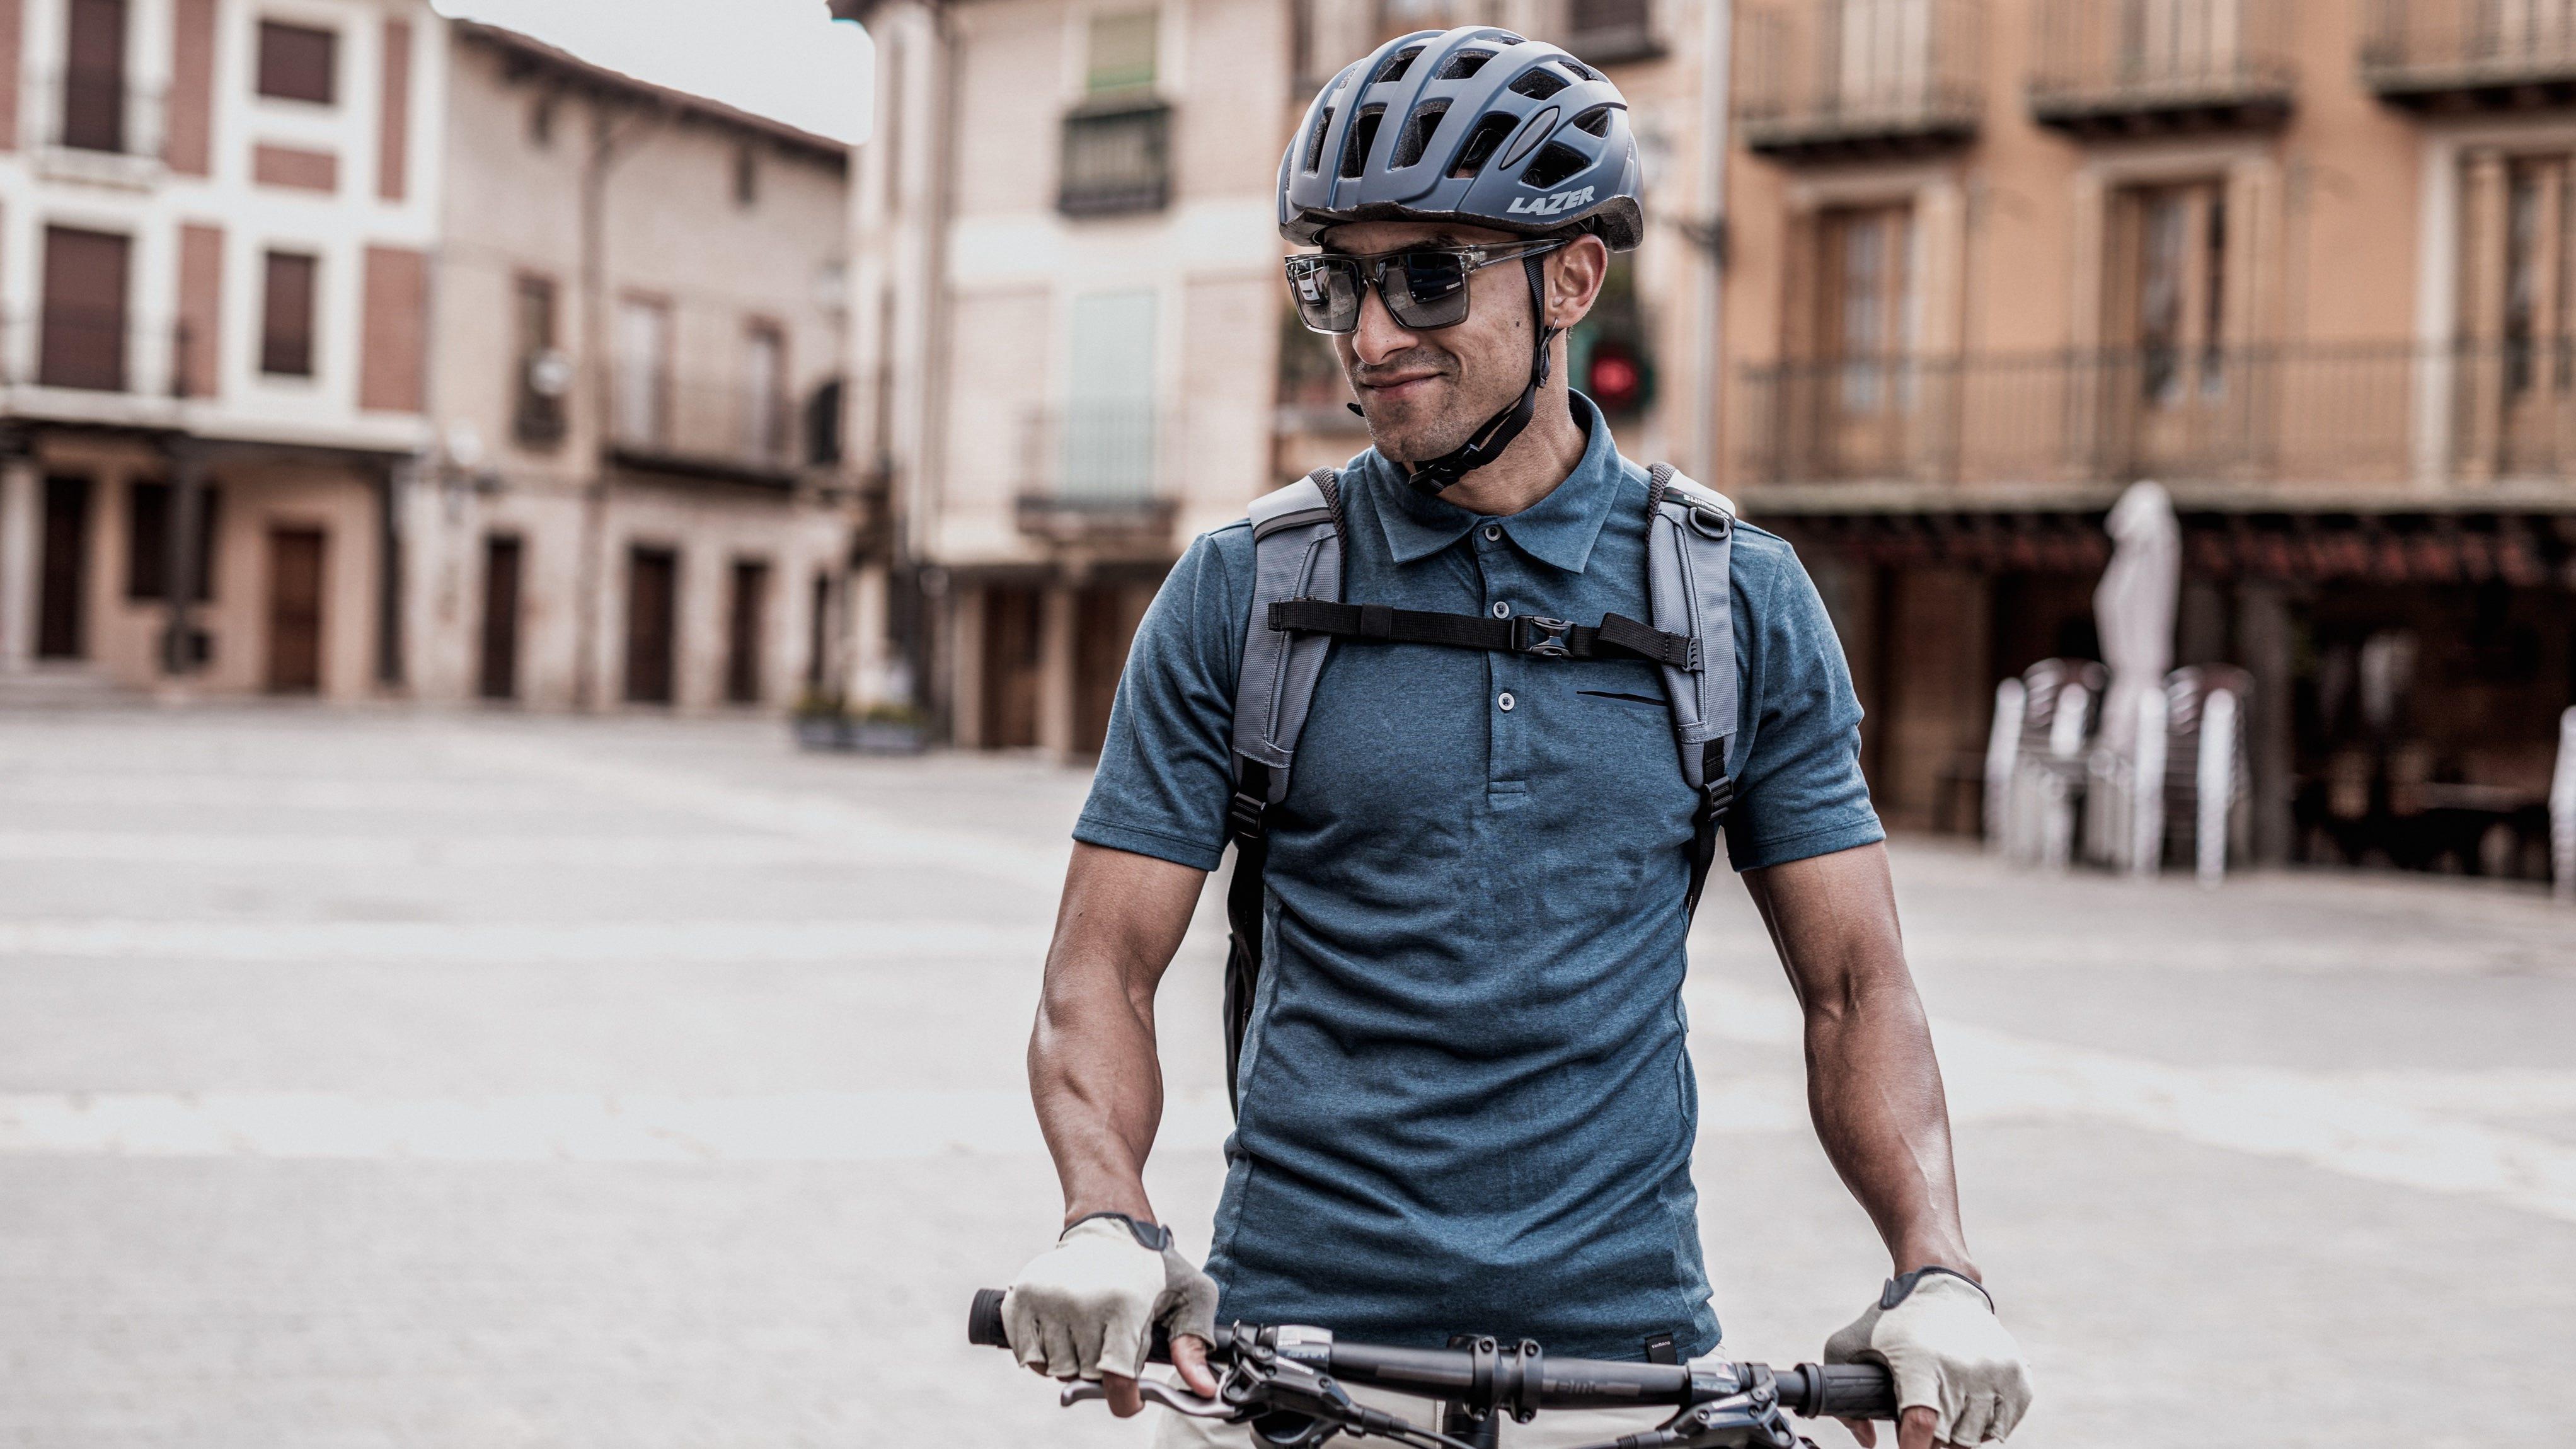 Lazer helmets: a buyer's guide